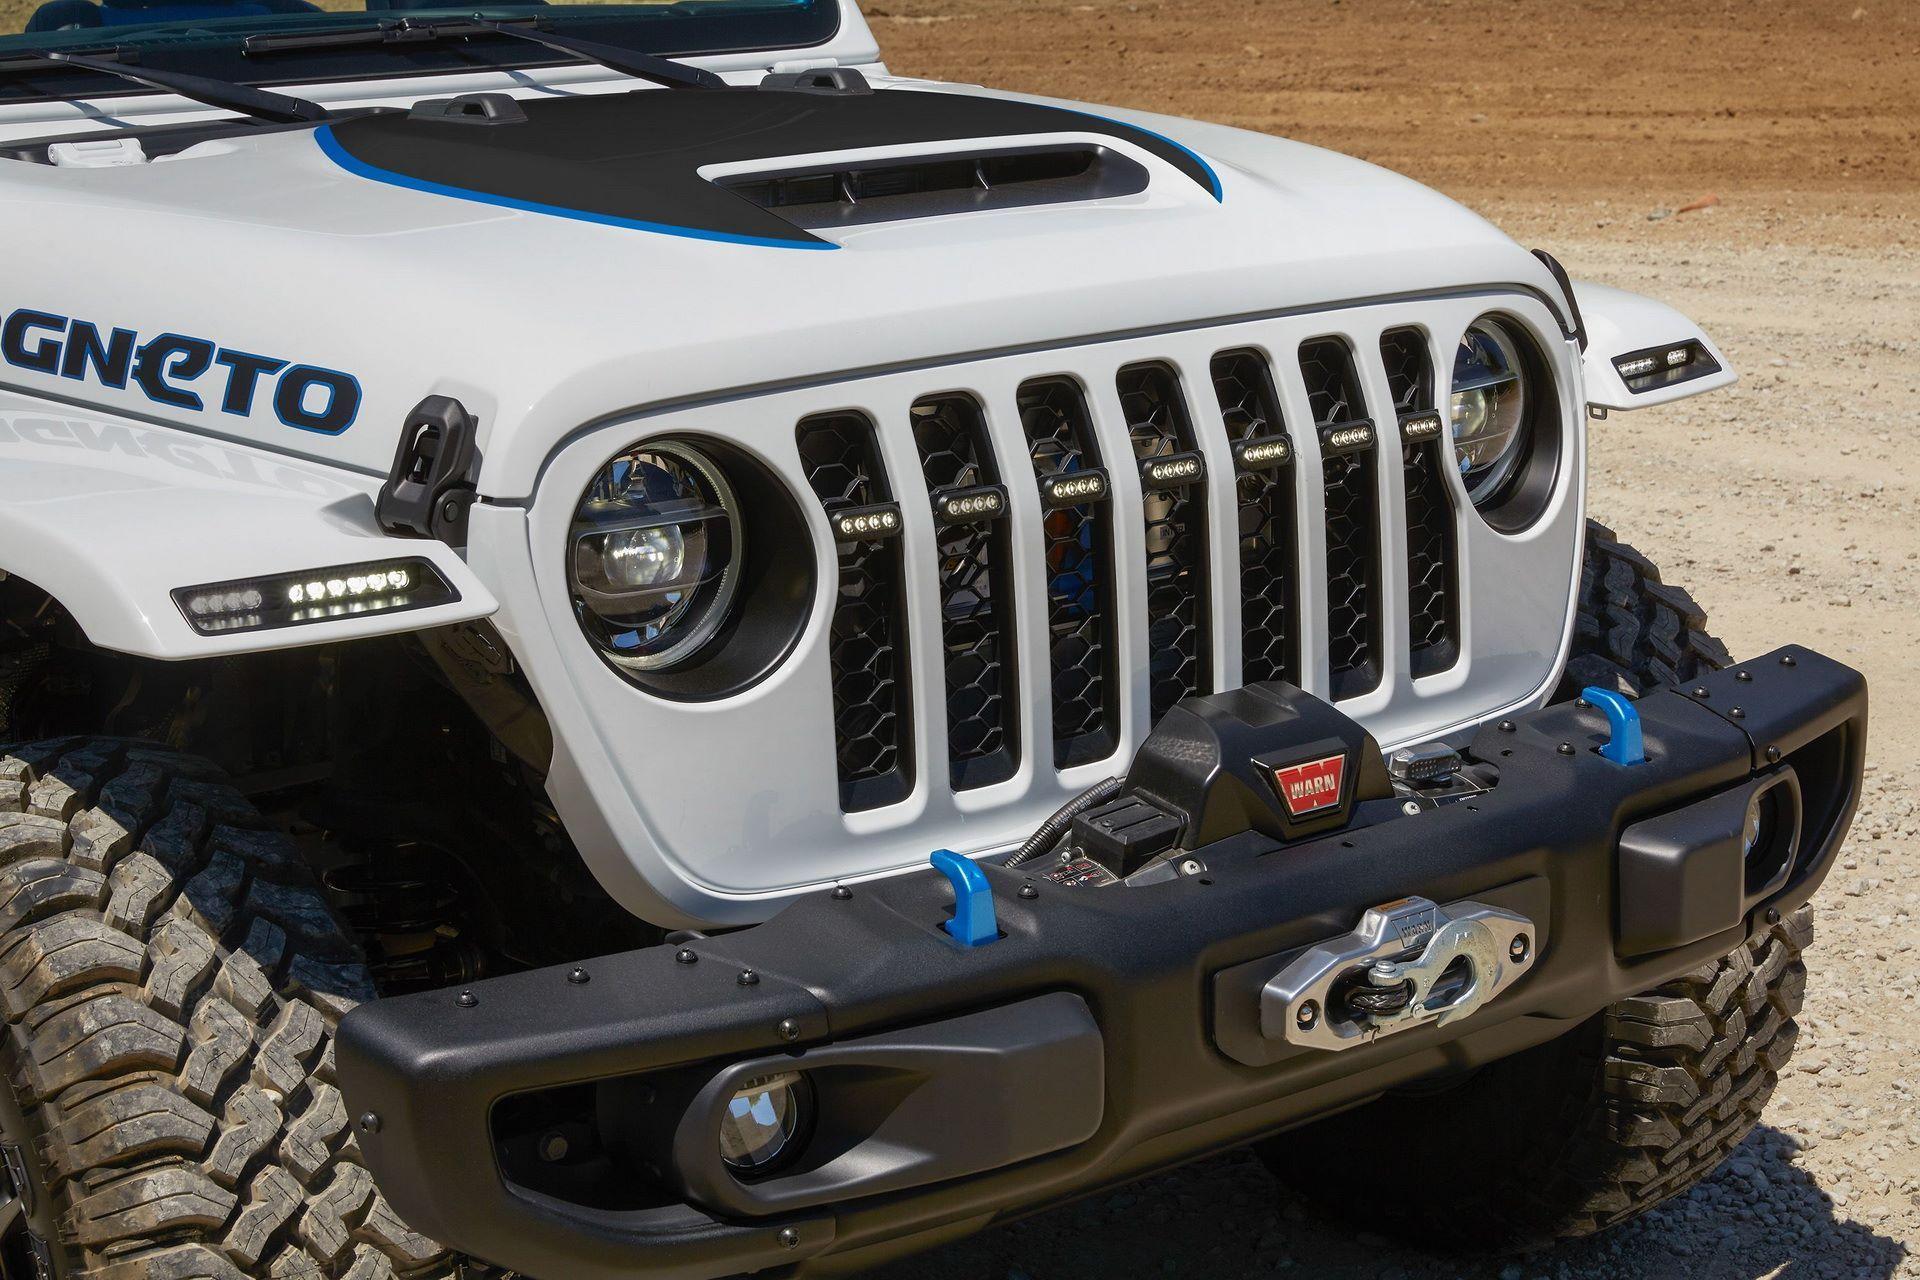 2020-jeep-wrangler-magneto-electric-concept-6